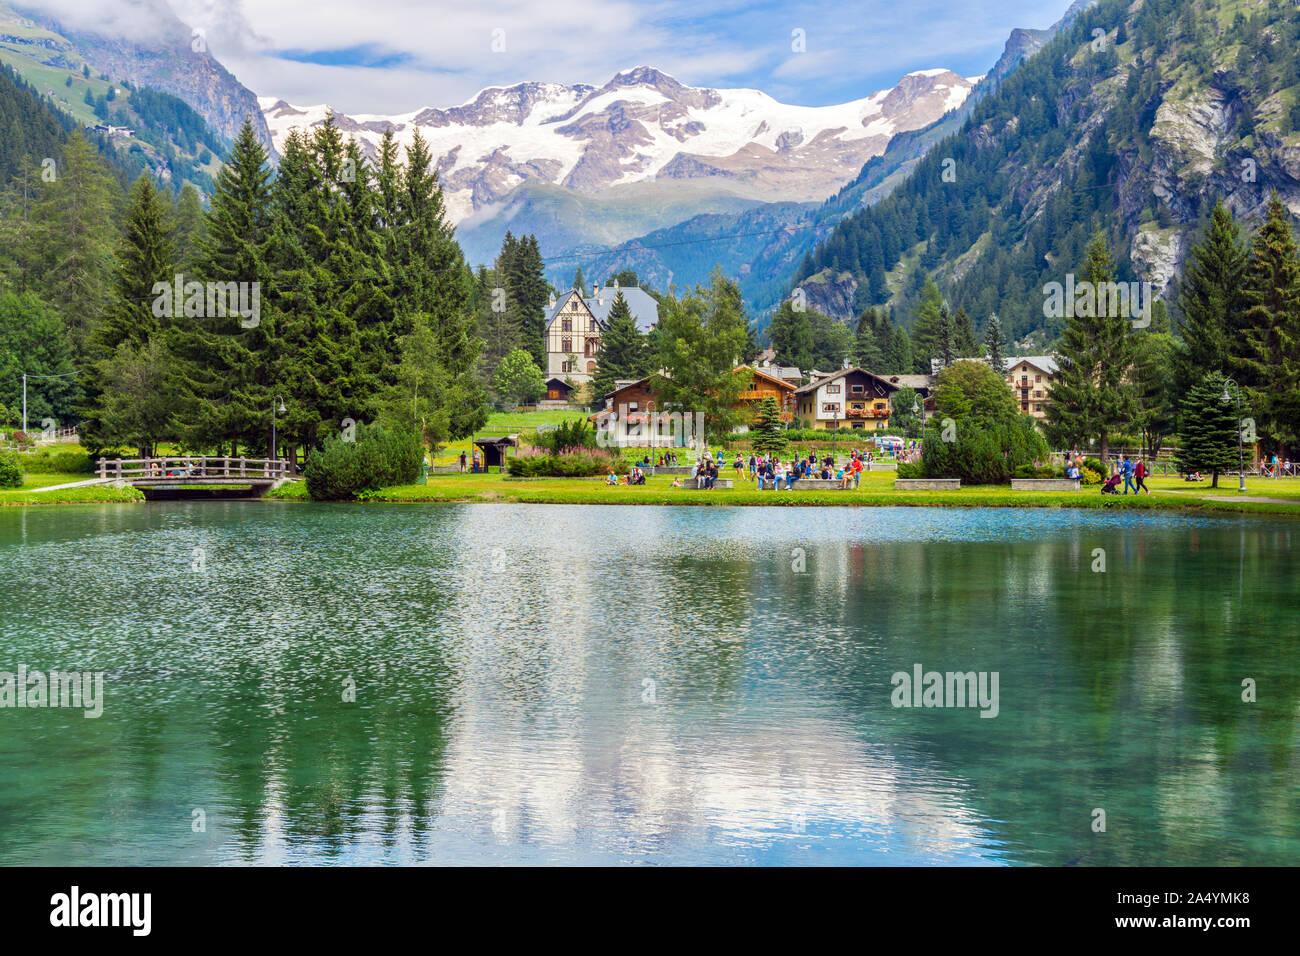 Italy, Aosta Valley, Gressoney-Saint-Jean, Lago di Gover, Monte Rosa in backgrounds Stock Photo